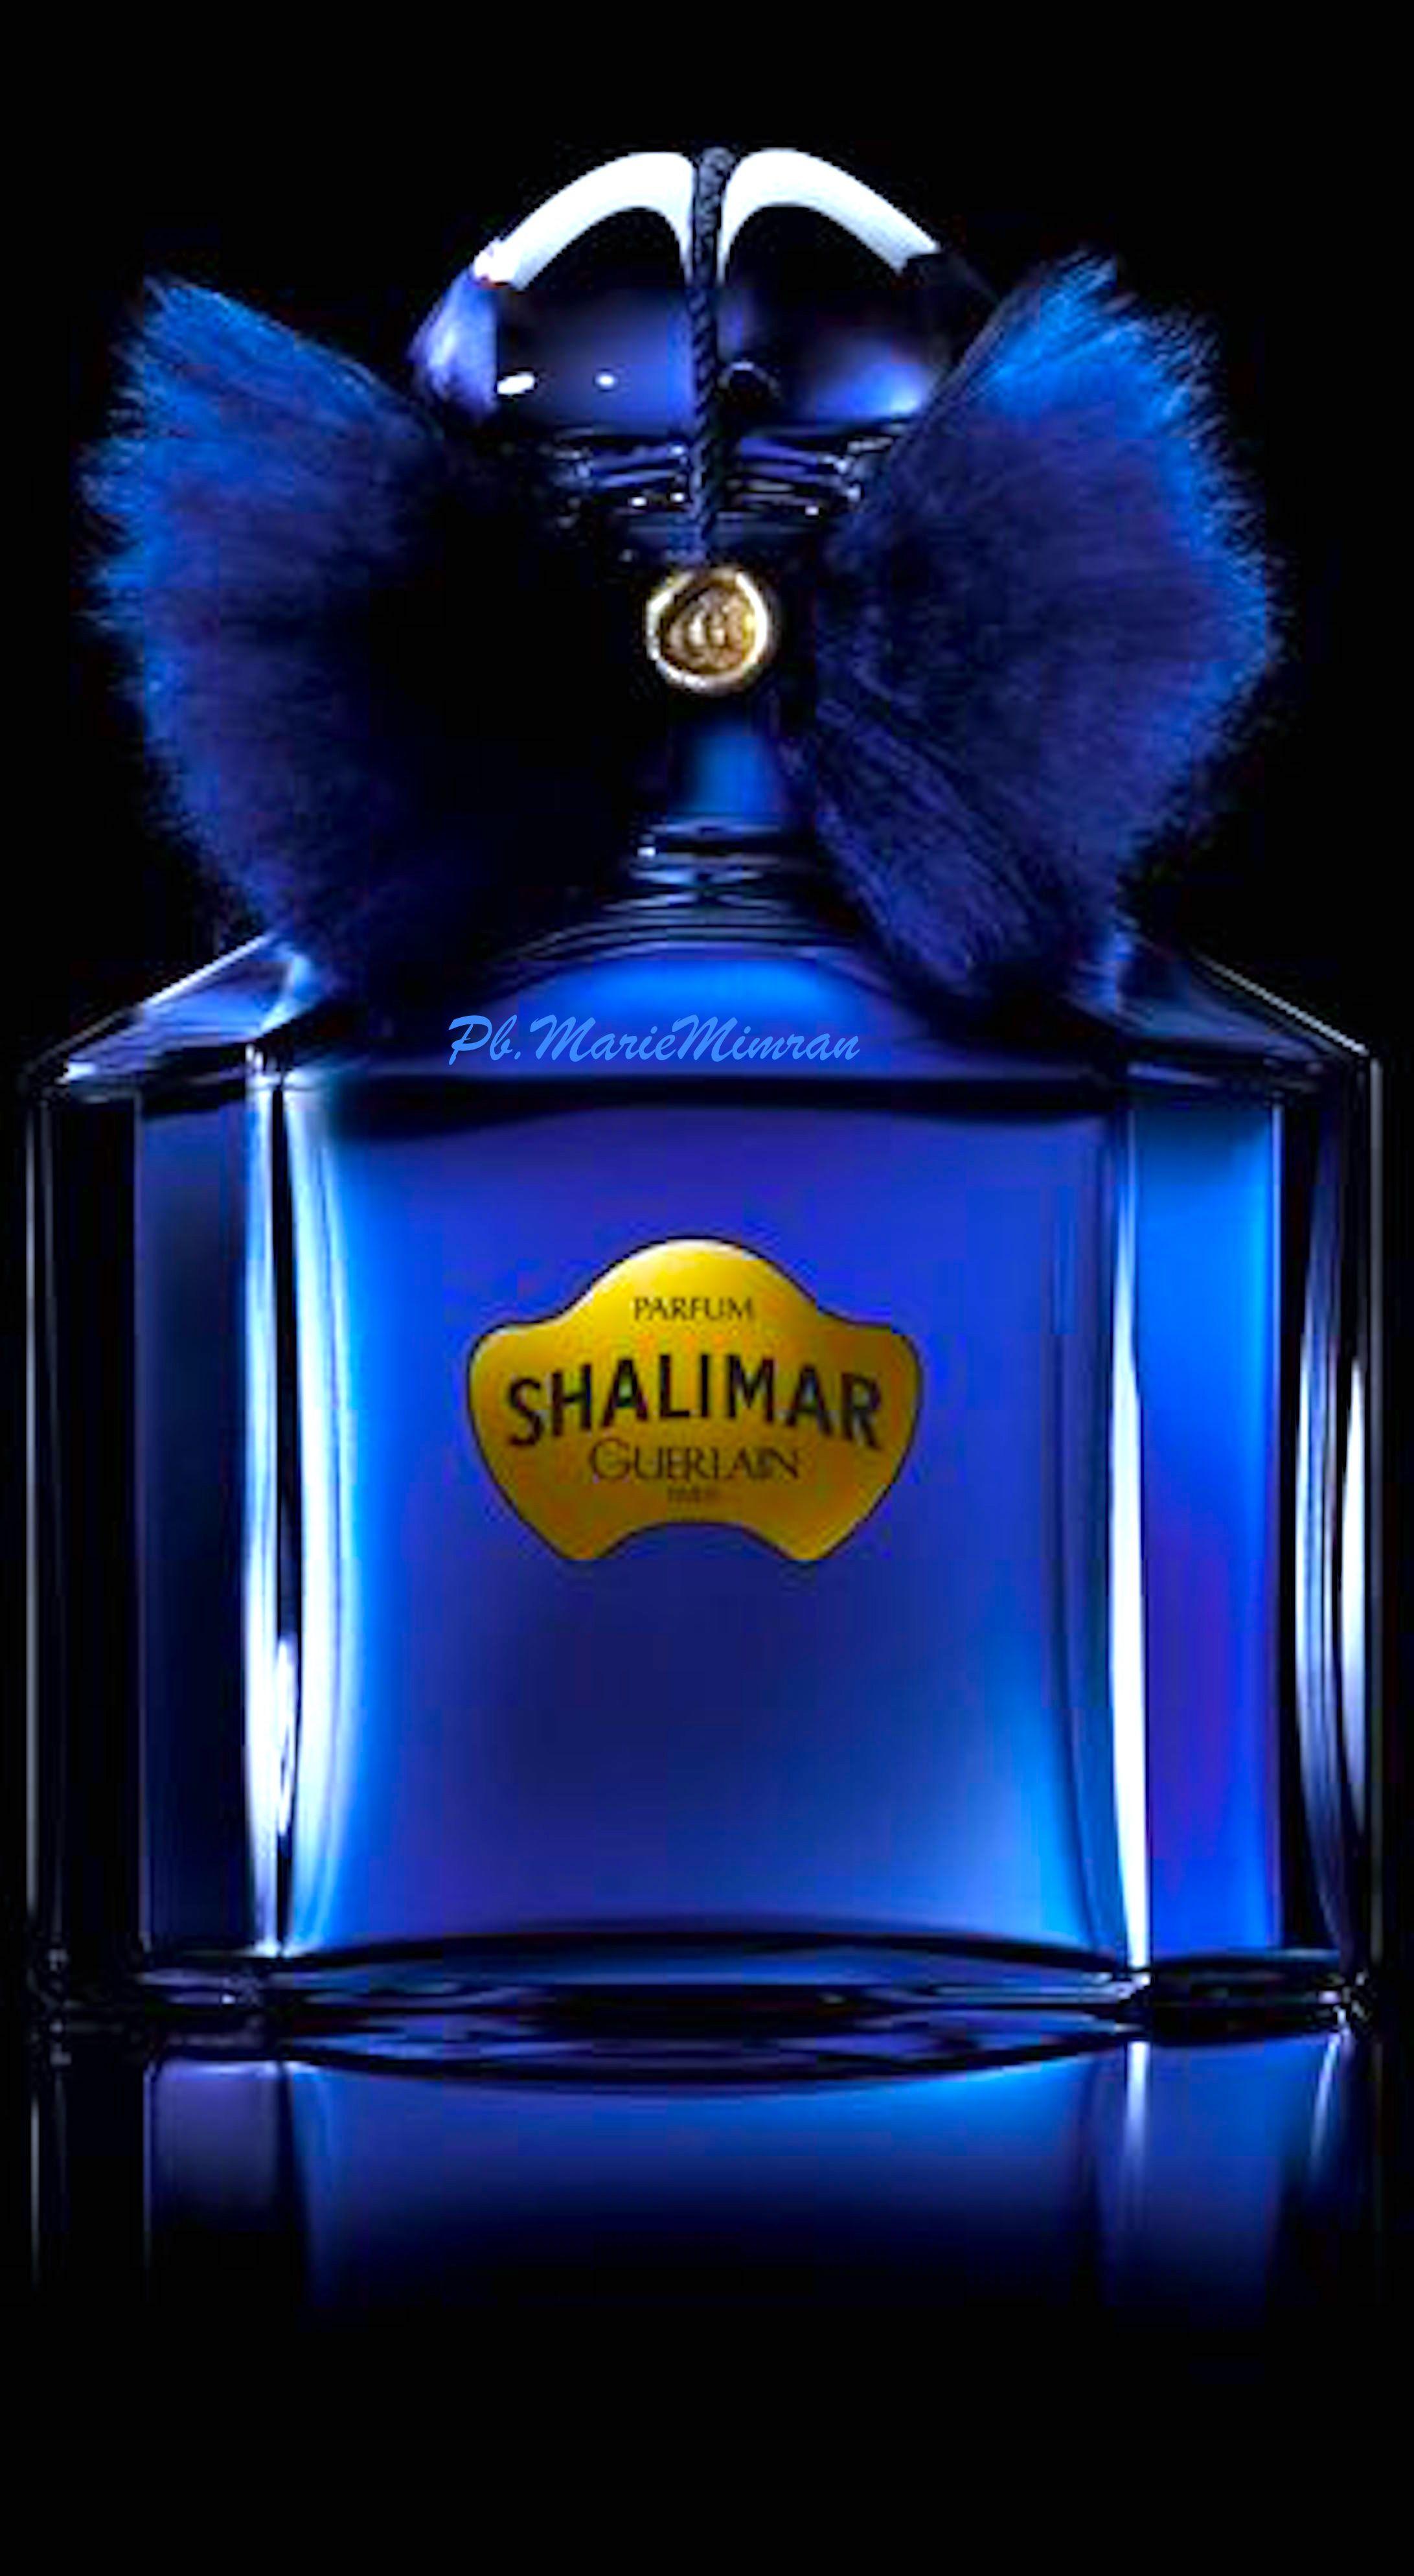 Guerlain Marie Mimran Perfumemania Pinterest Blue Blue